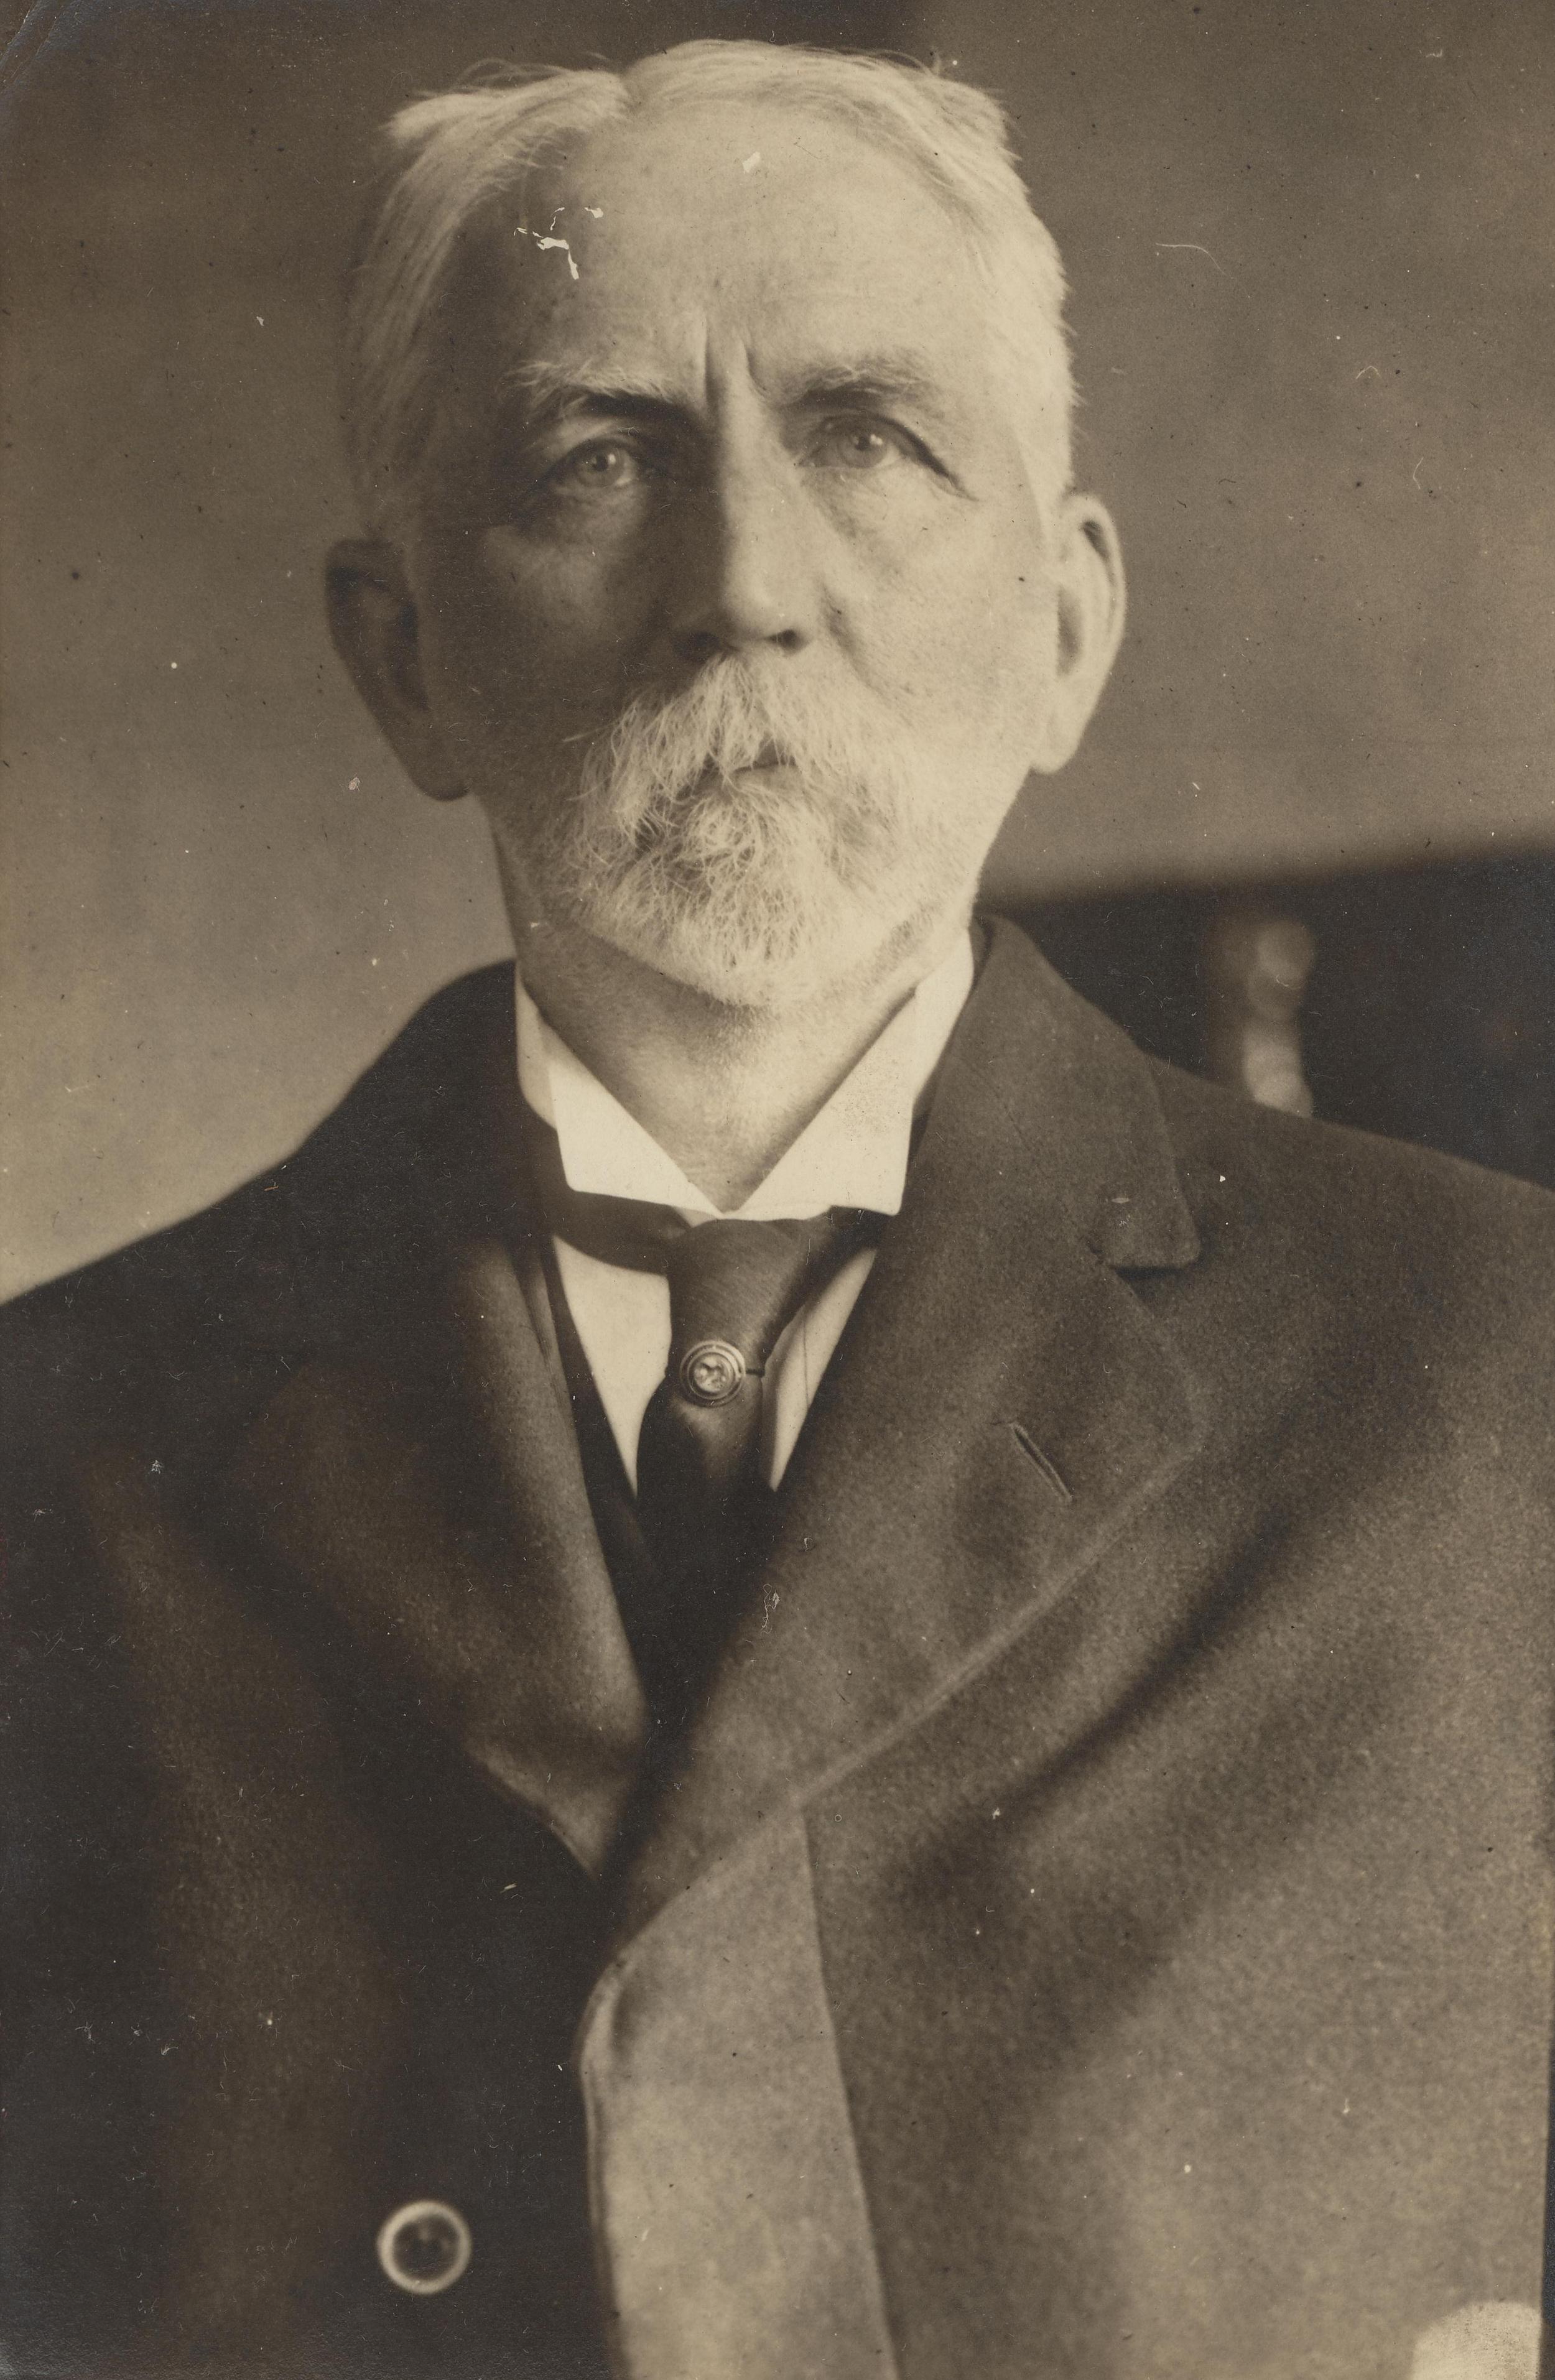 James L. Barton